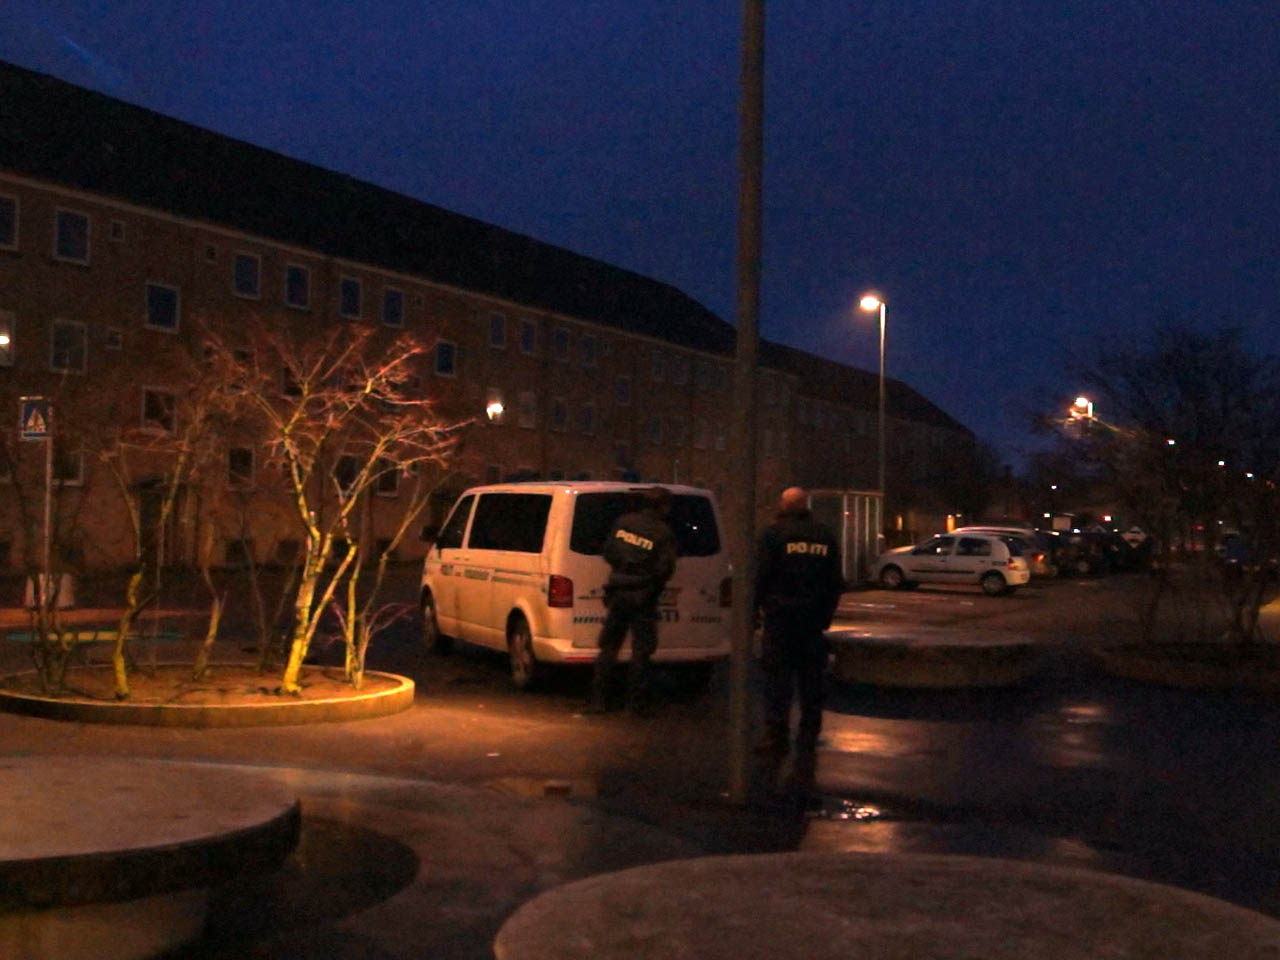 Mere politi på Motalavej i Korsør